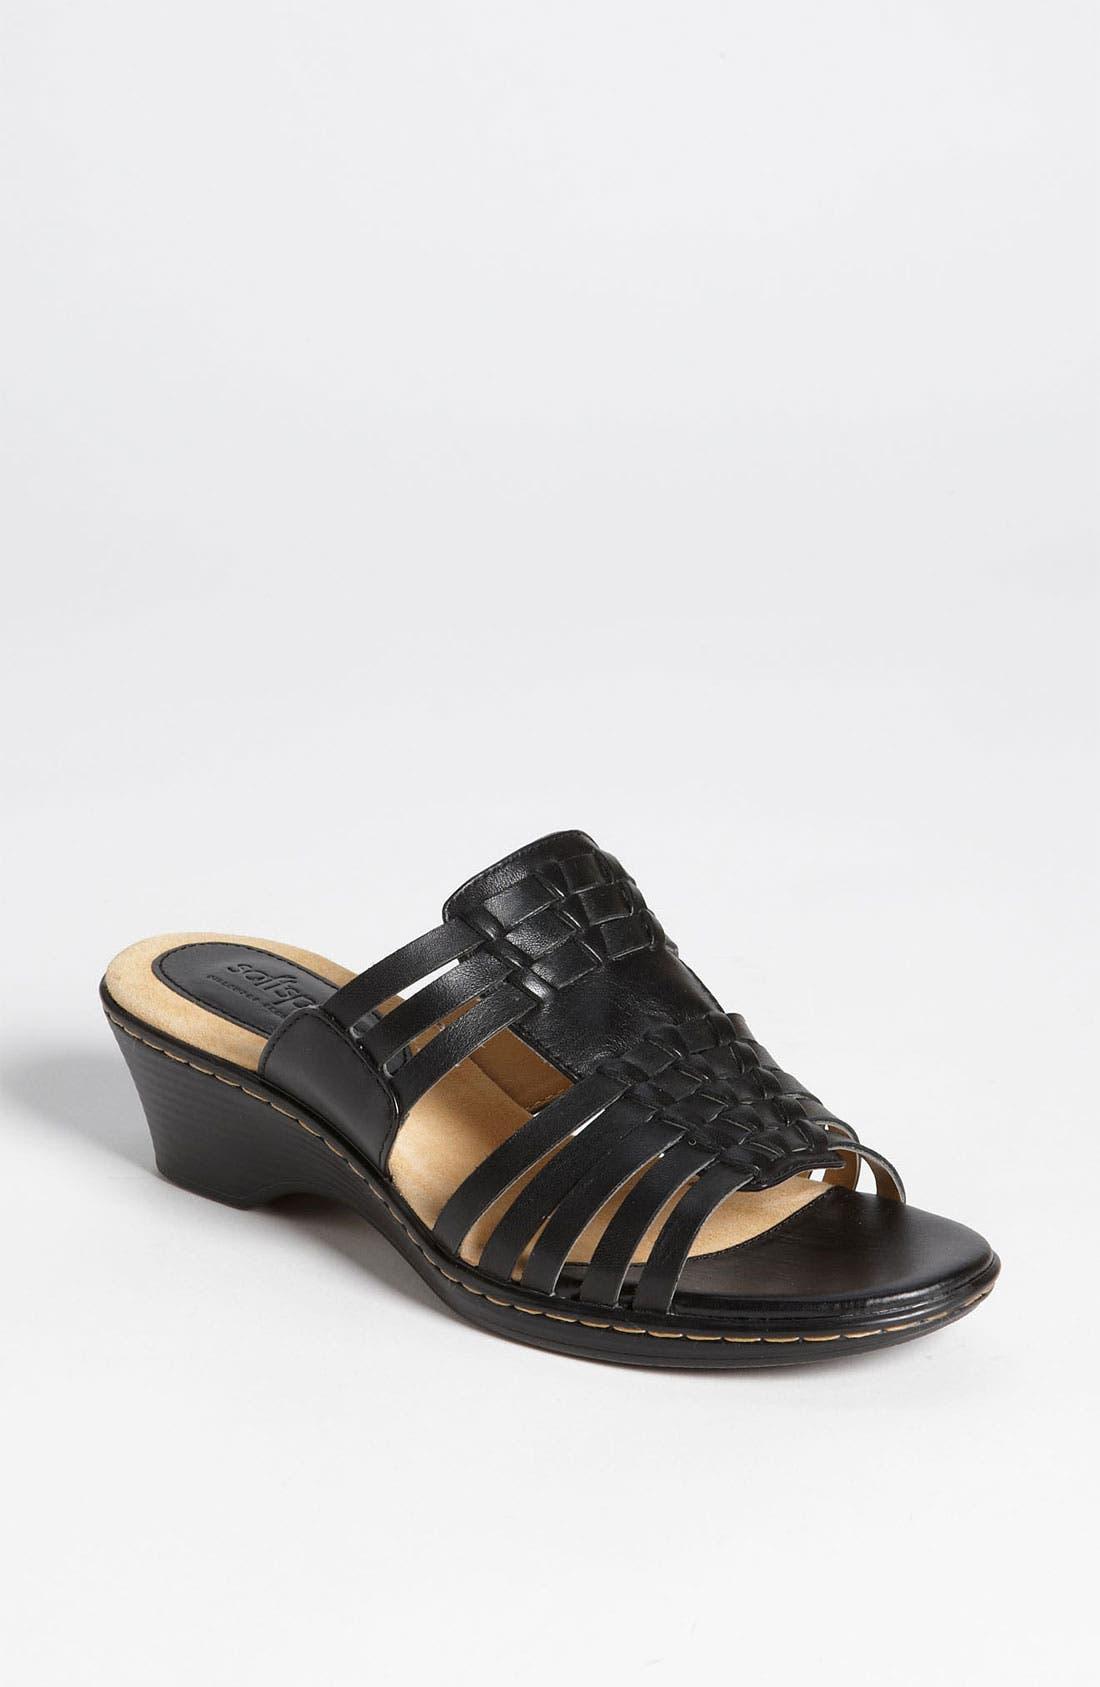 Alternate Image 1 Selected - Softspots 'Helix' Sandal